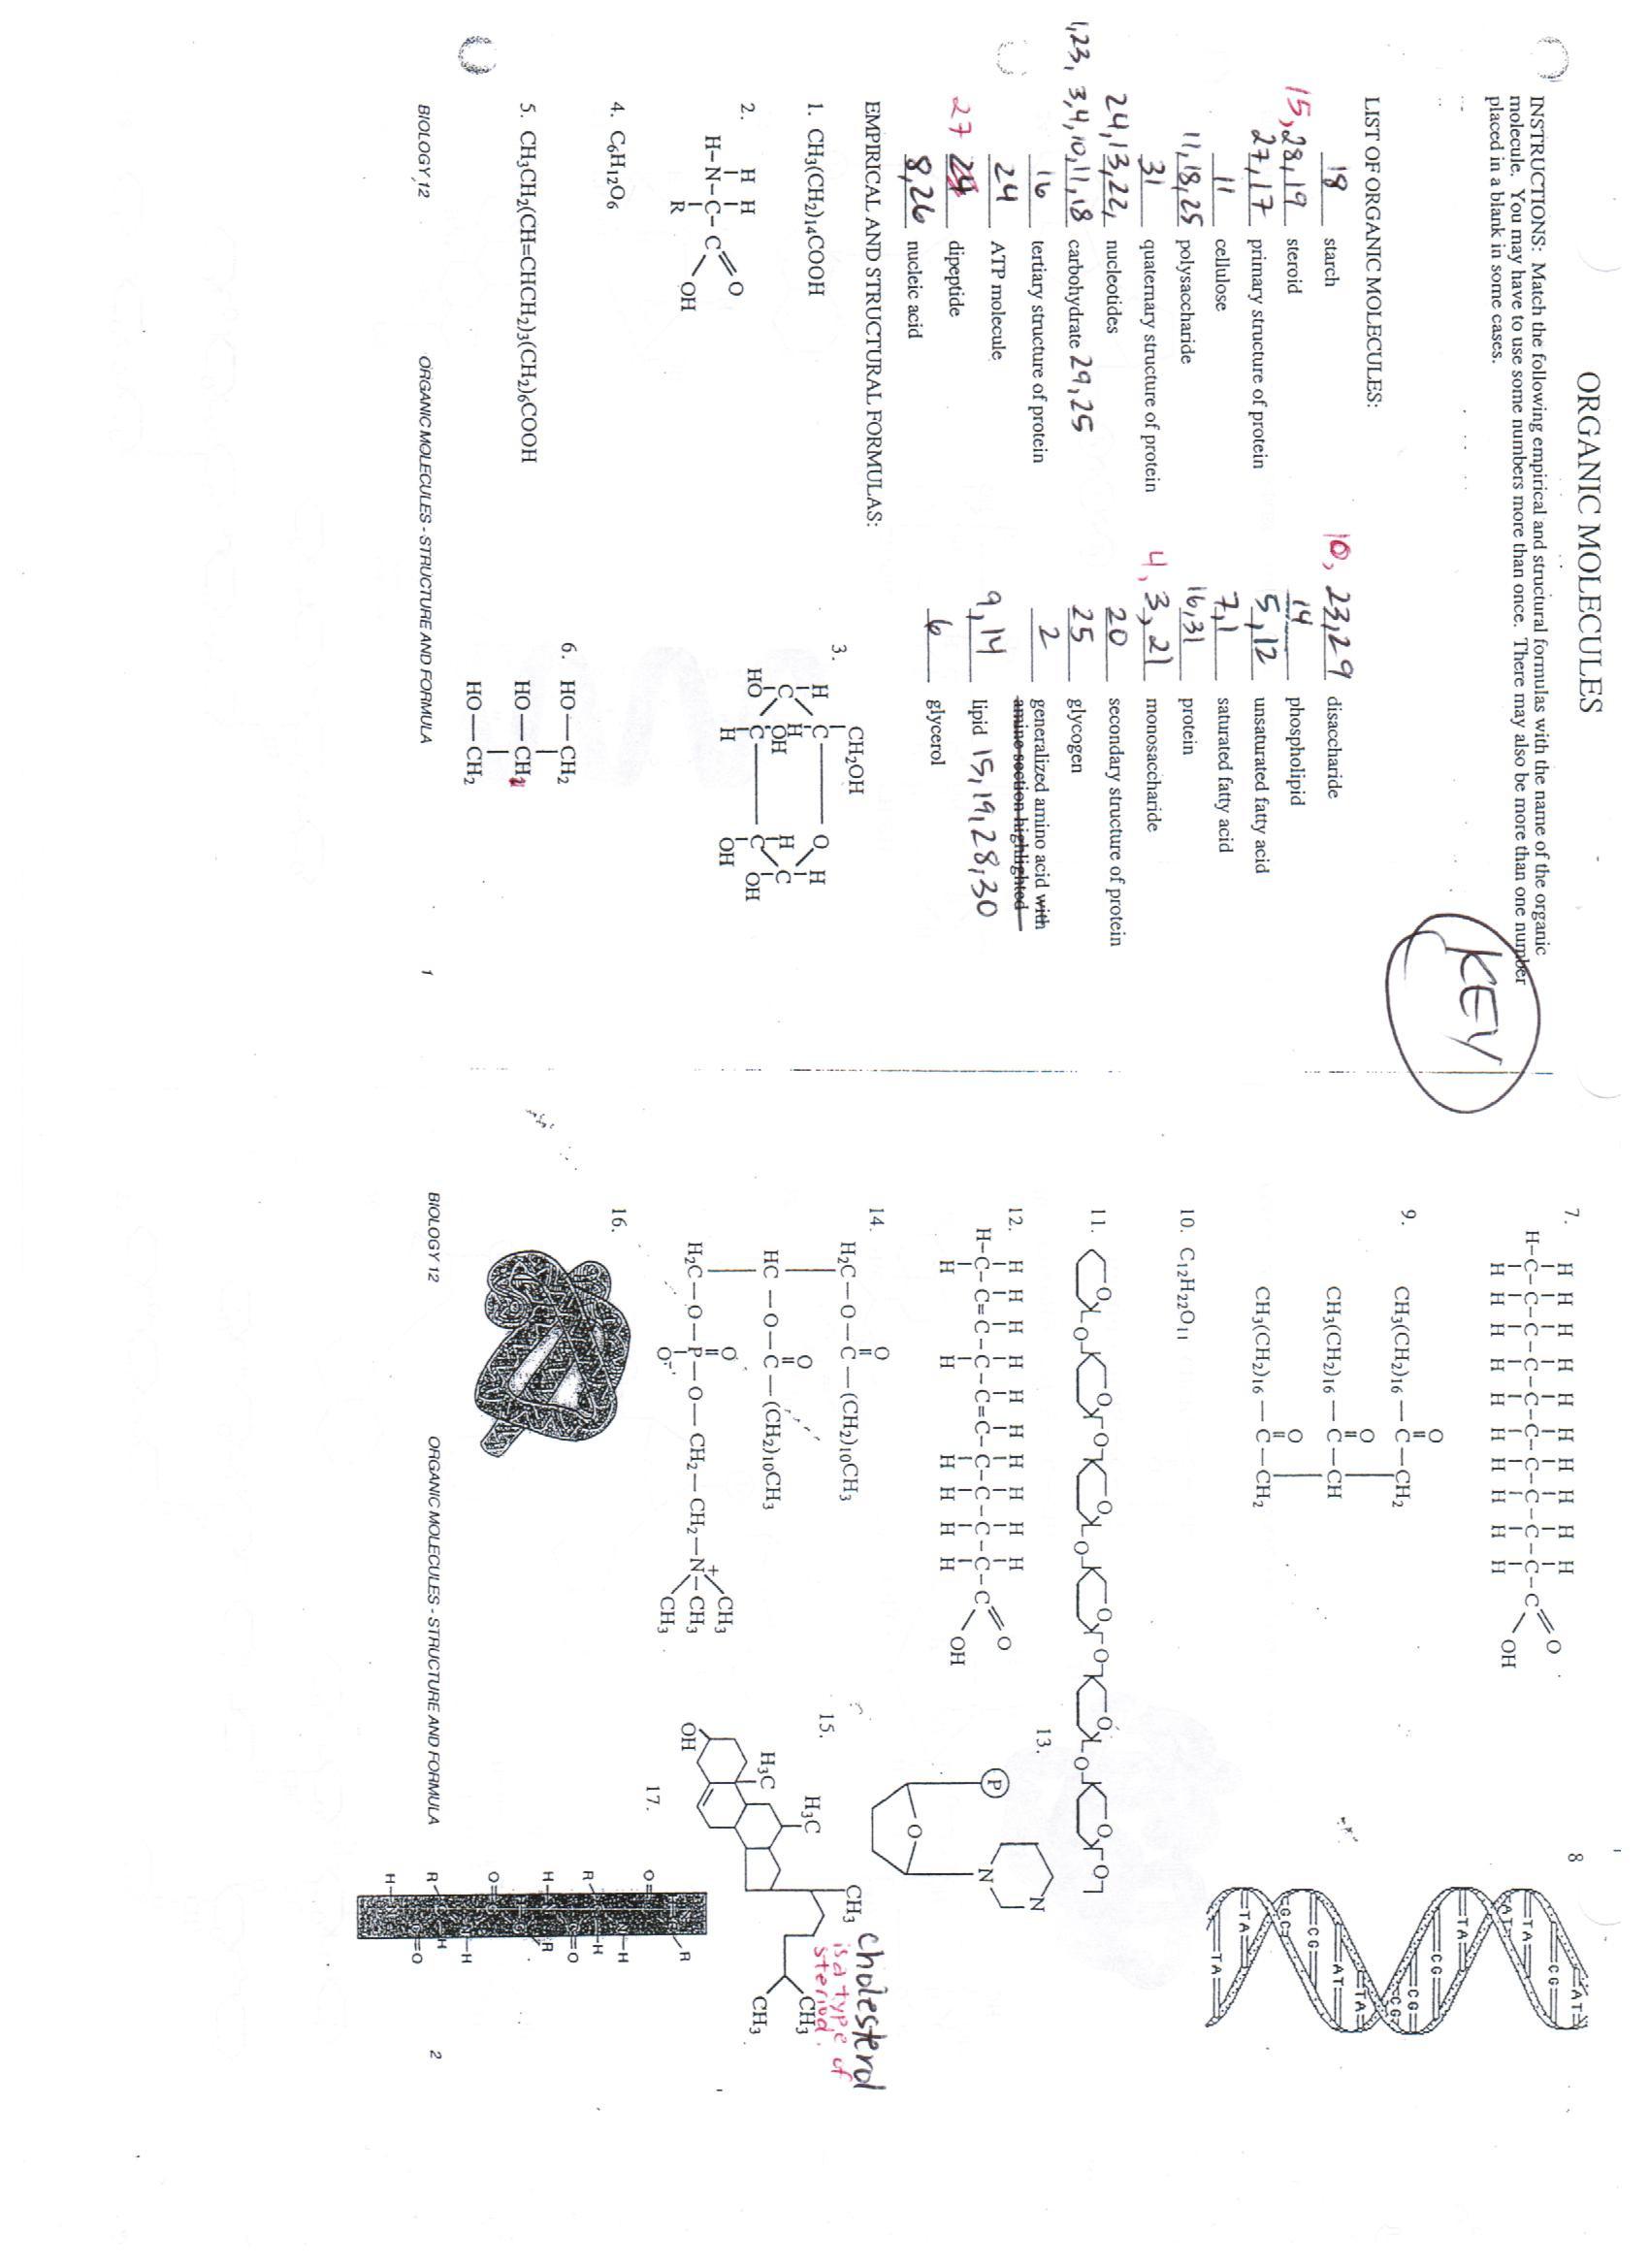 Biological Molecules Worksheet Answers Biomolecules Worksheet Answers